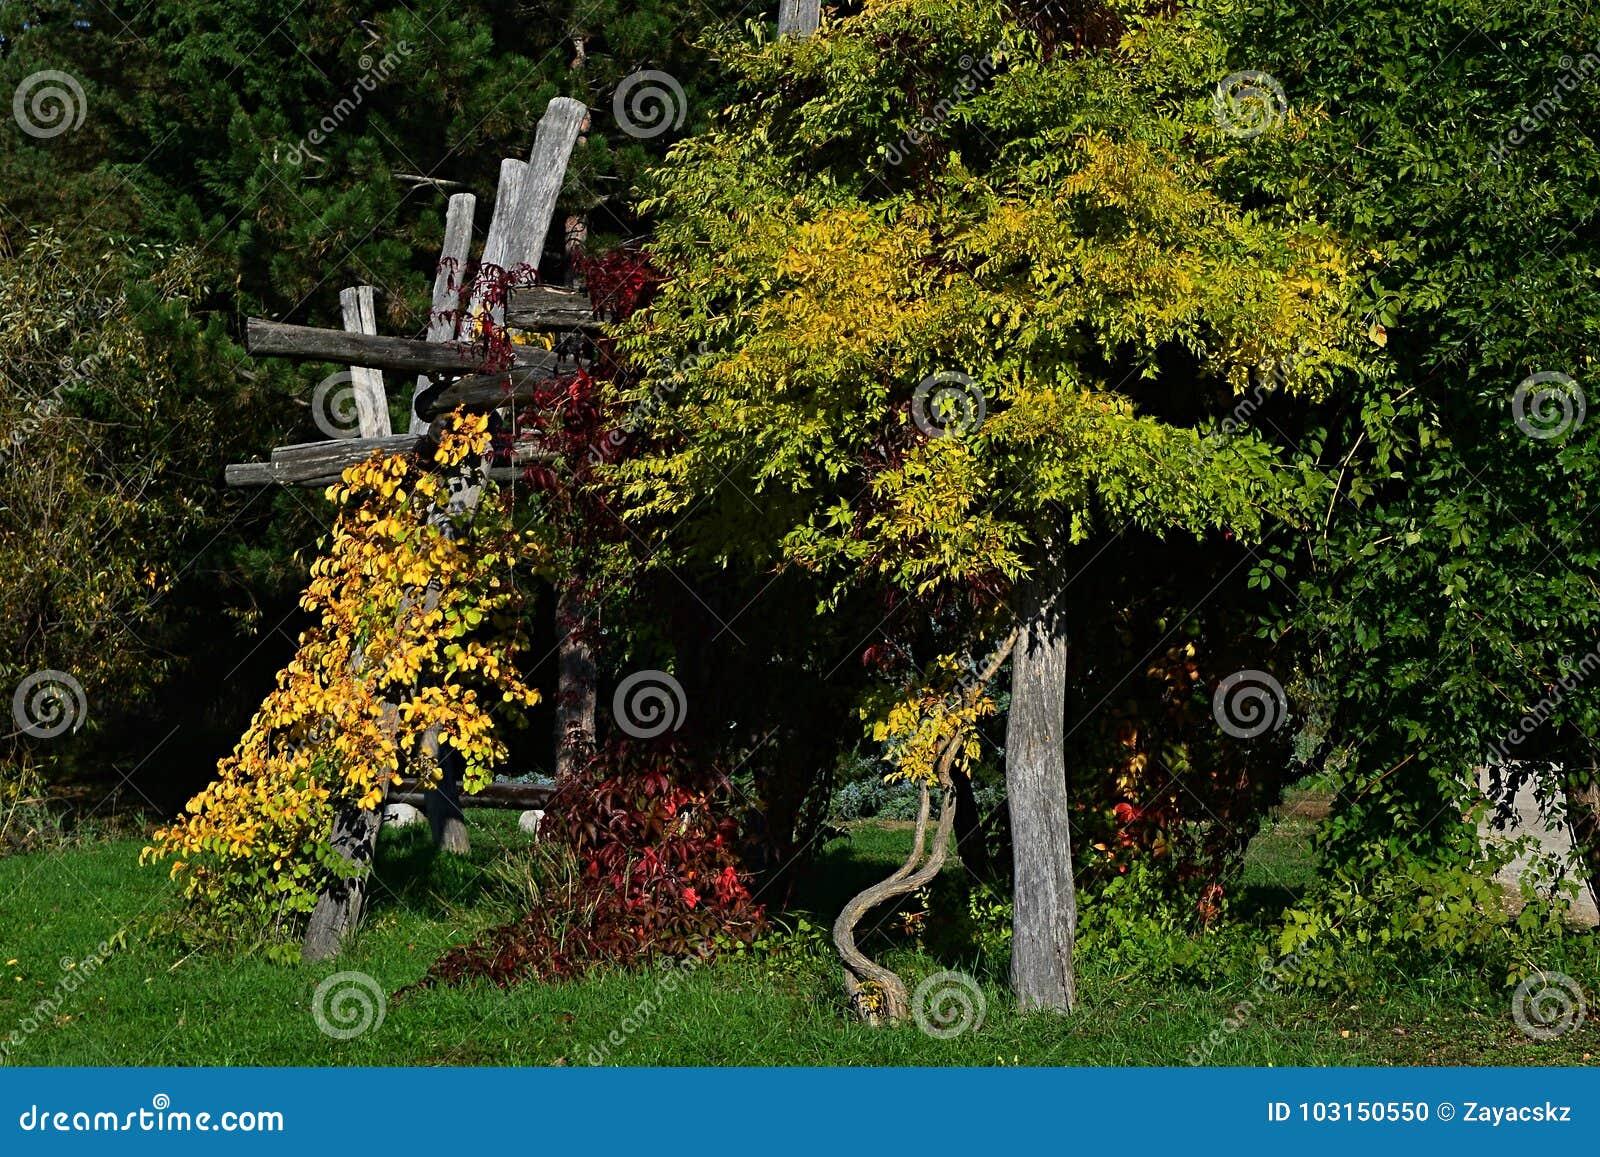 Construction of a pergola: vegetation